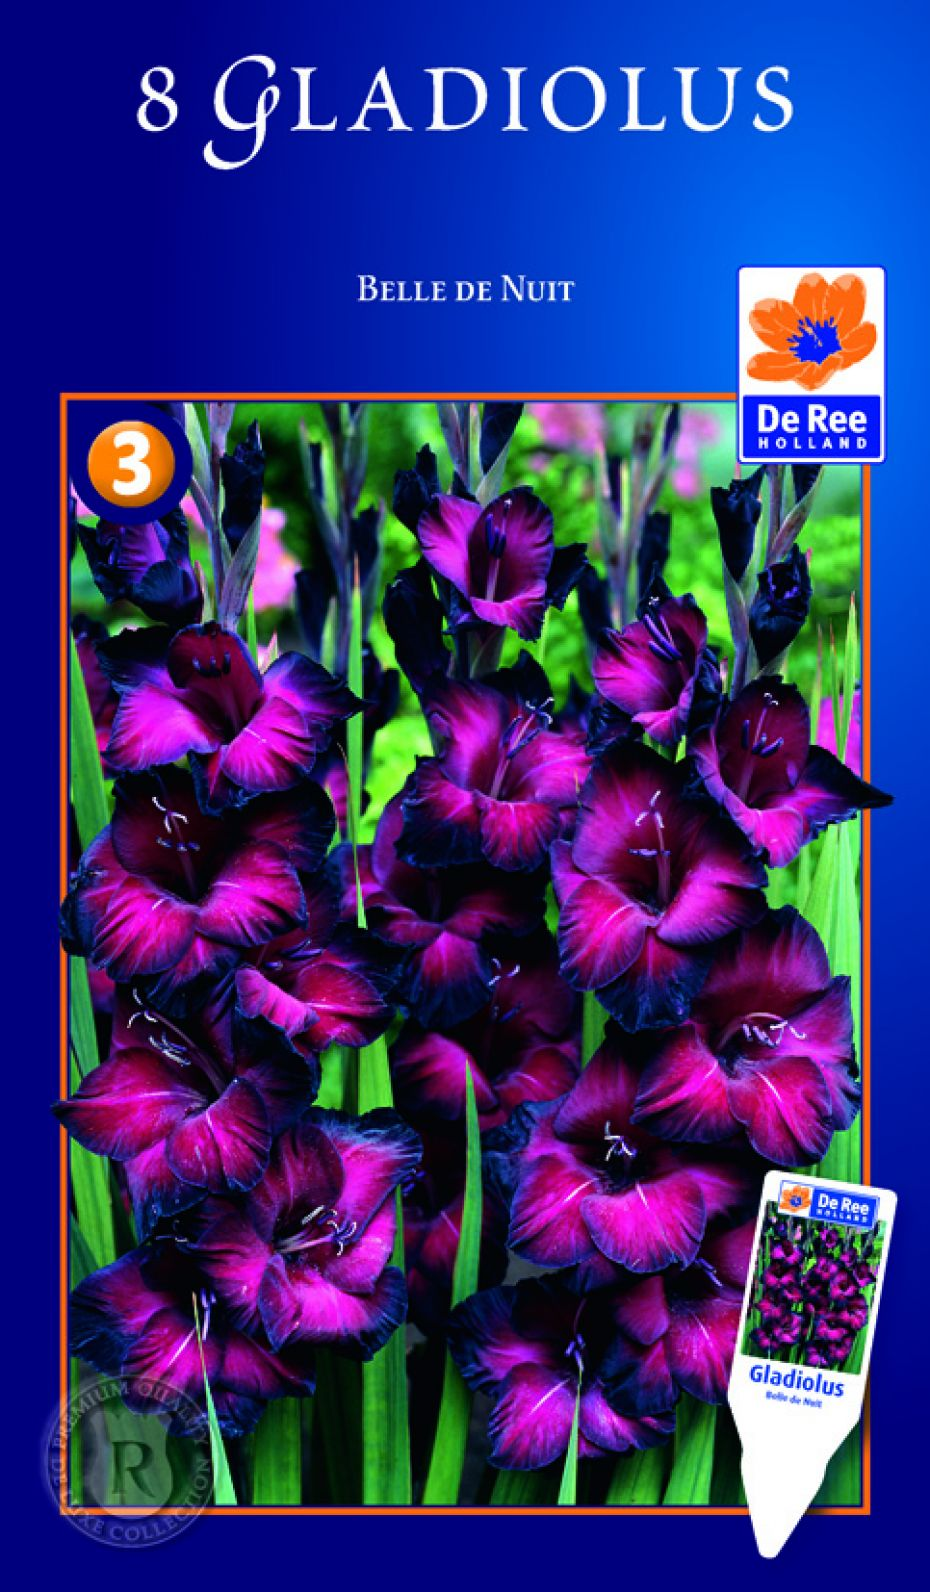 Gladiolus major - Belle de nuit plante ...